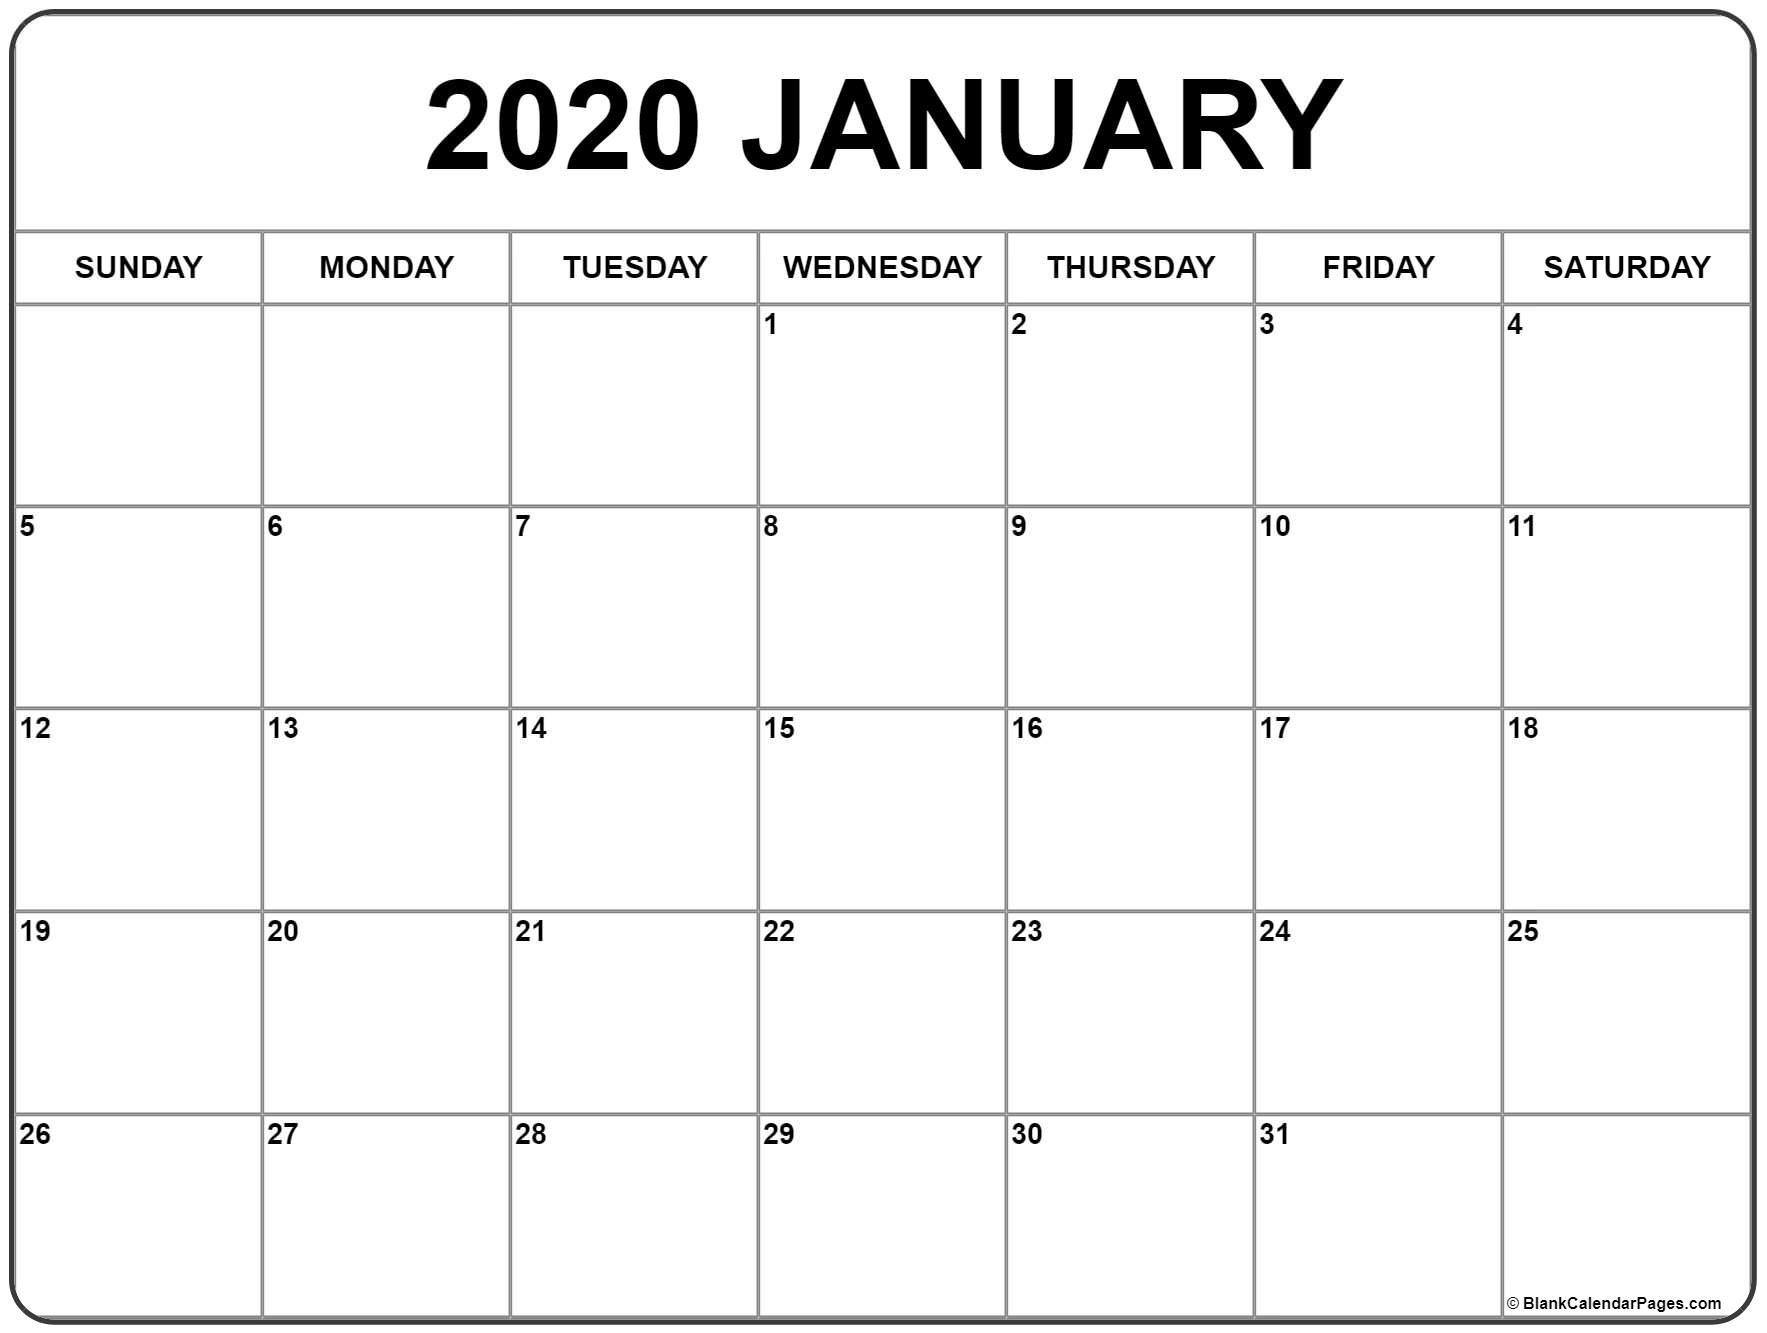 January 2020 Calendar | Free Printable Monthly Calendars-January 2020 Calendar Canada